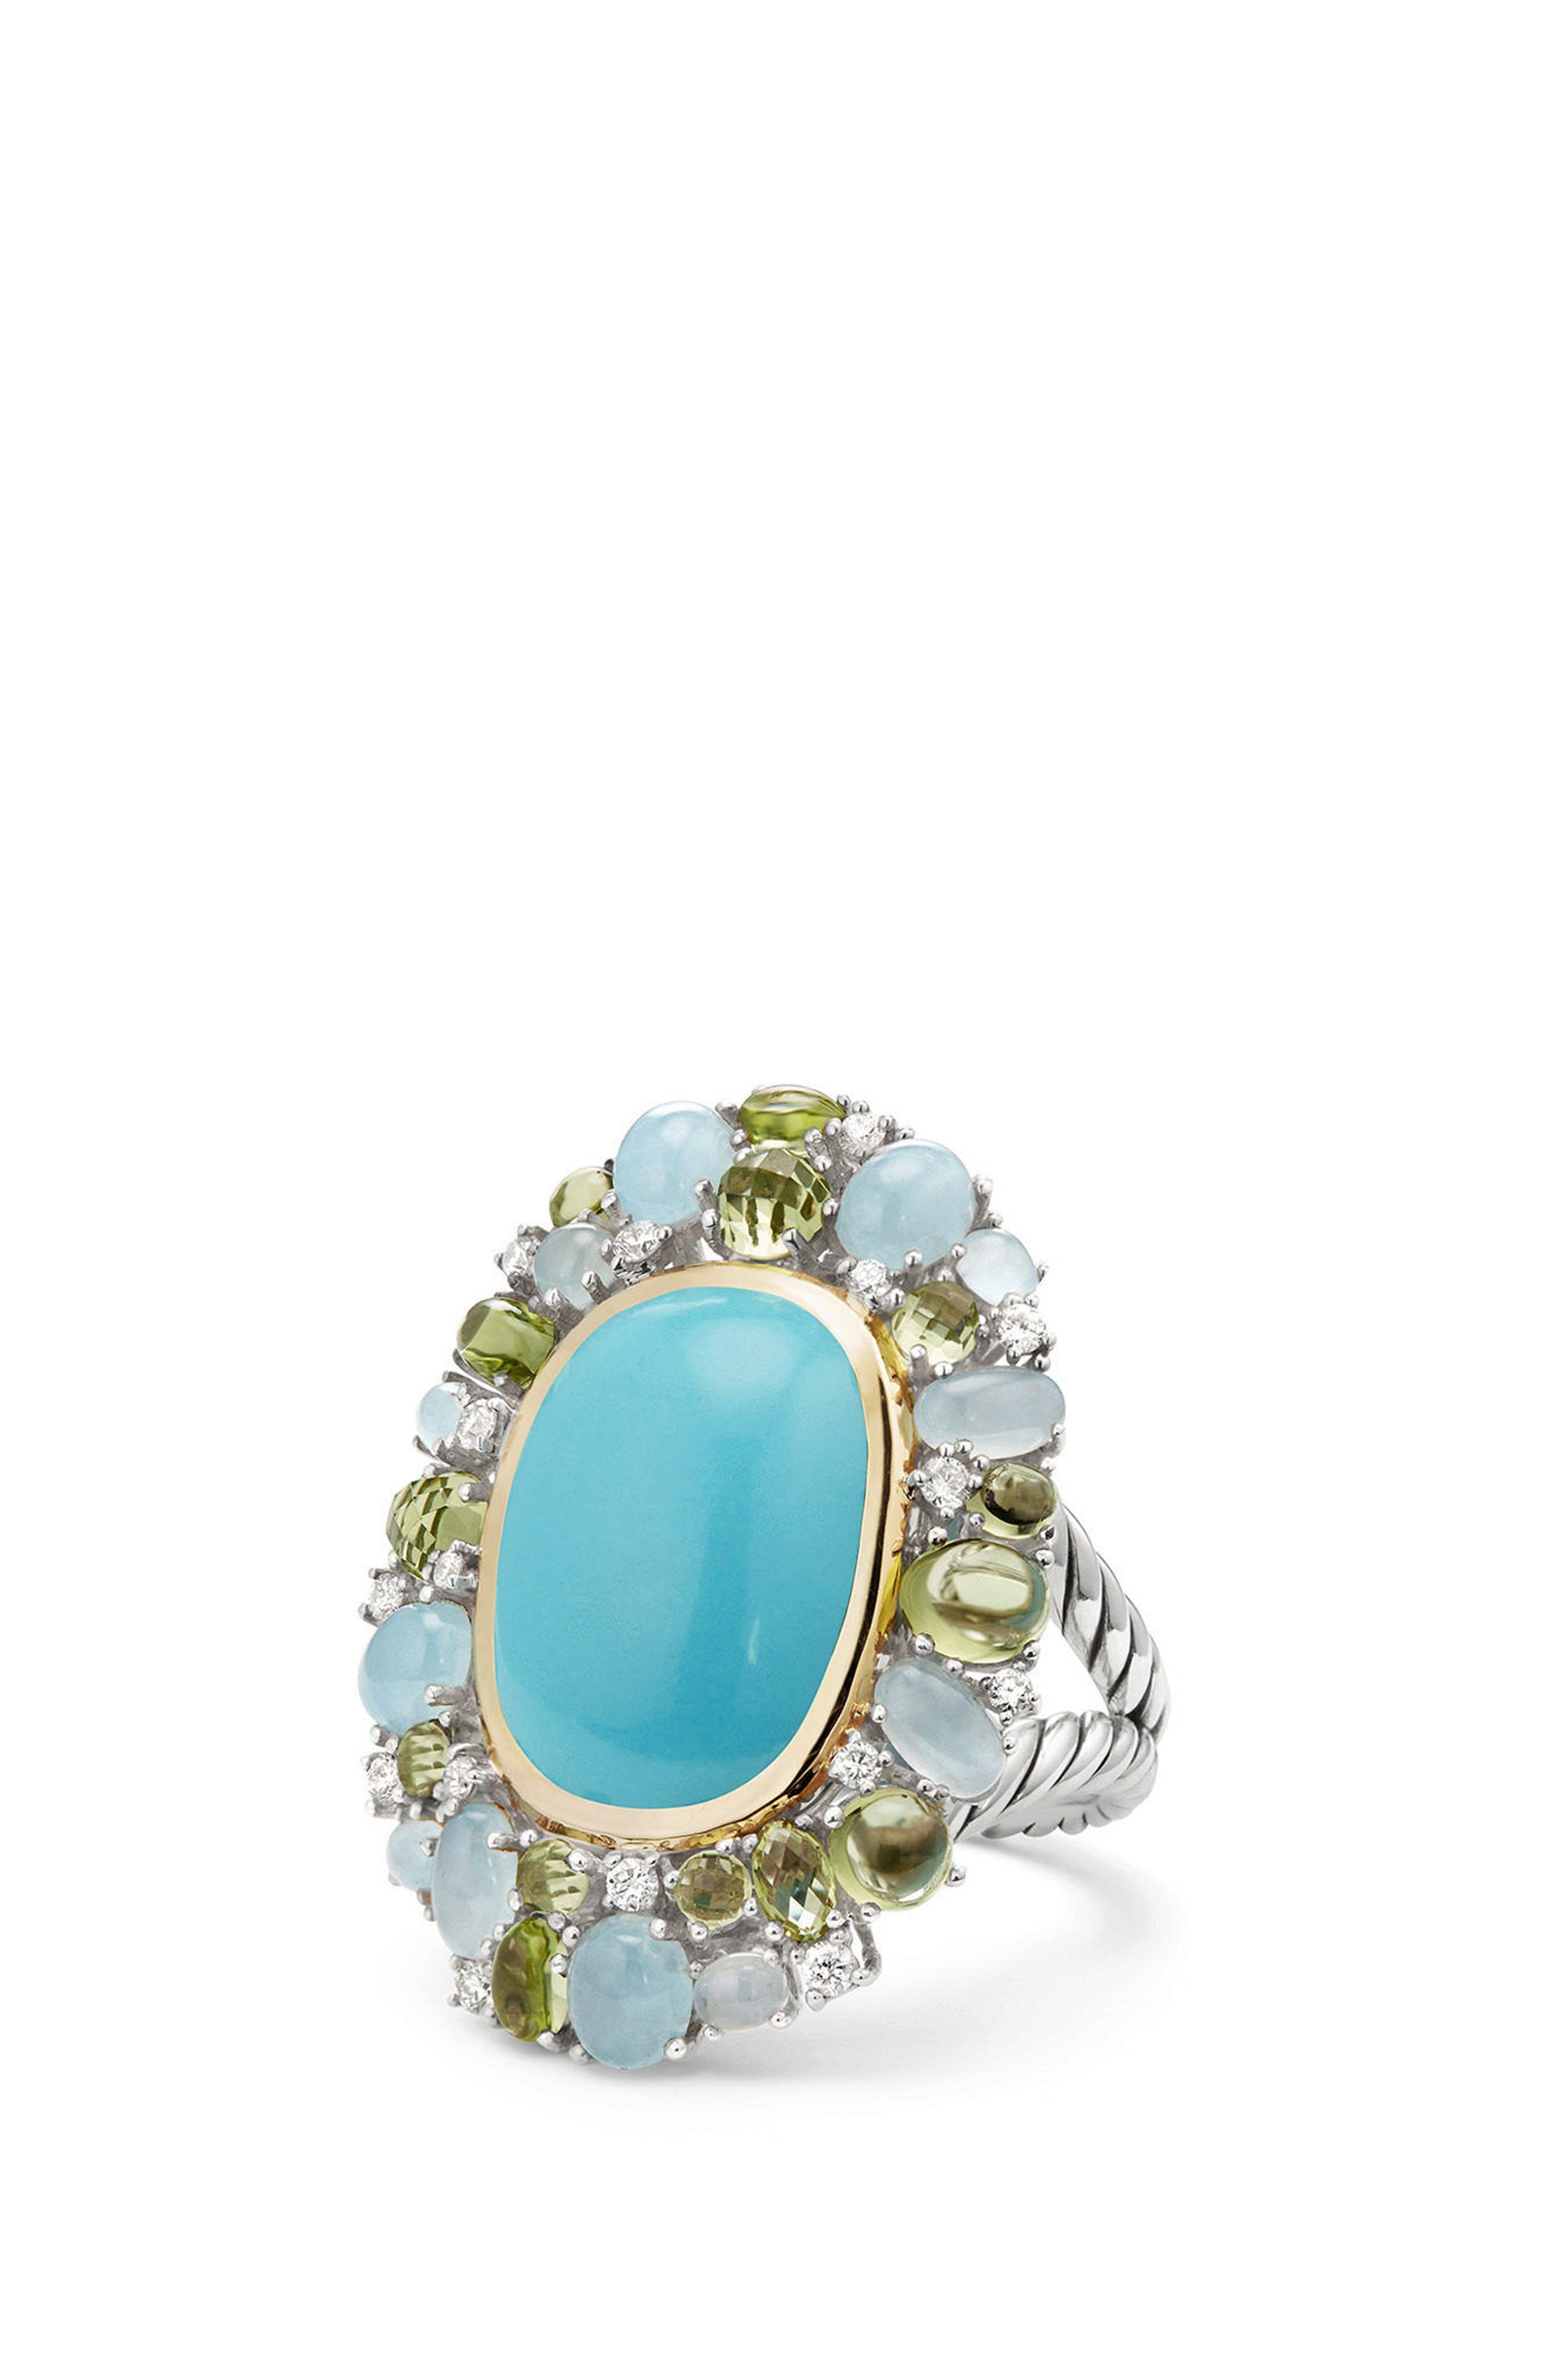 Main Image - David Yurman Mustique Statement Ring with Diamonds